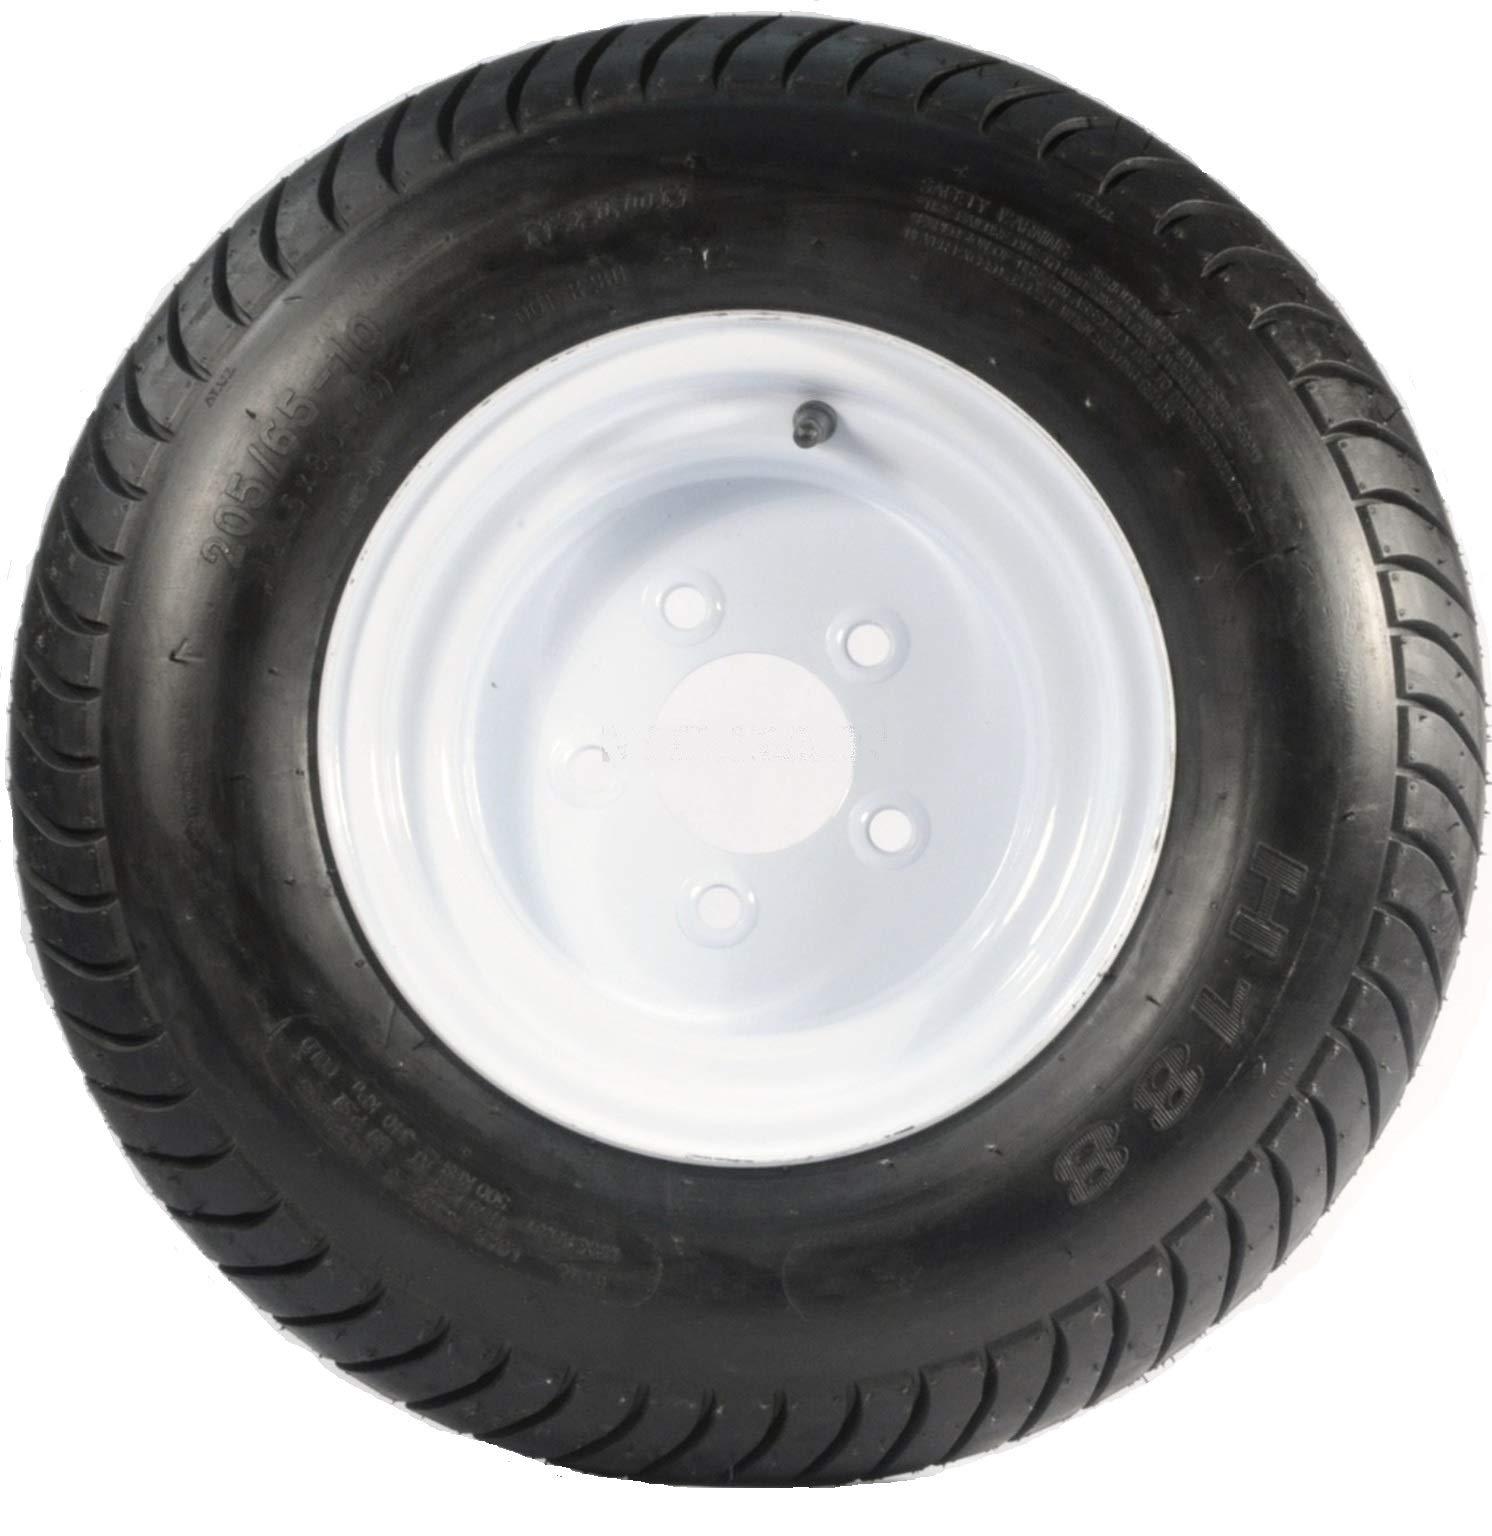 Kenda Loadstar 205/65-10 LRE 10 PR Bias Trailer Tire on 10'' 5 Lug White Steel Trailer Wheel by Kenda Loadstar